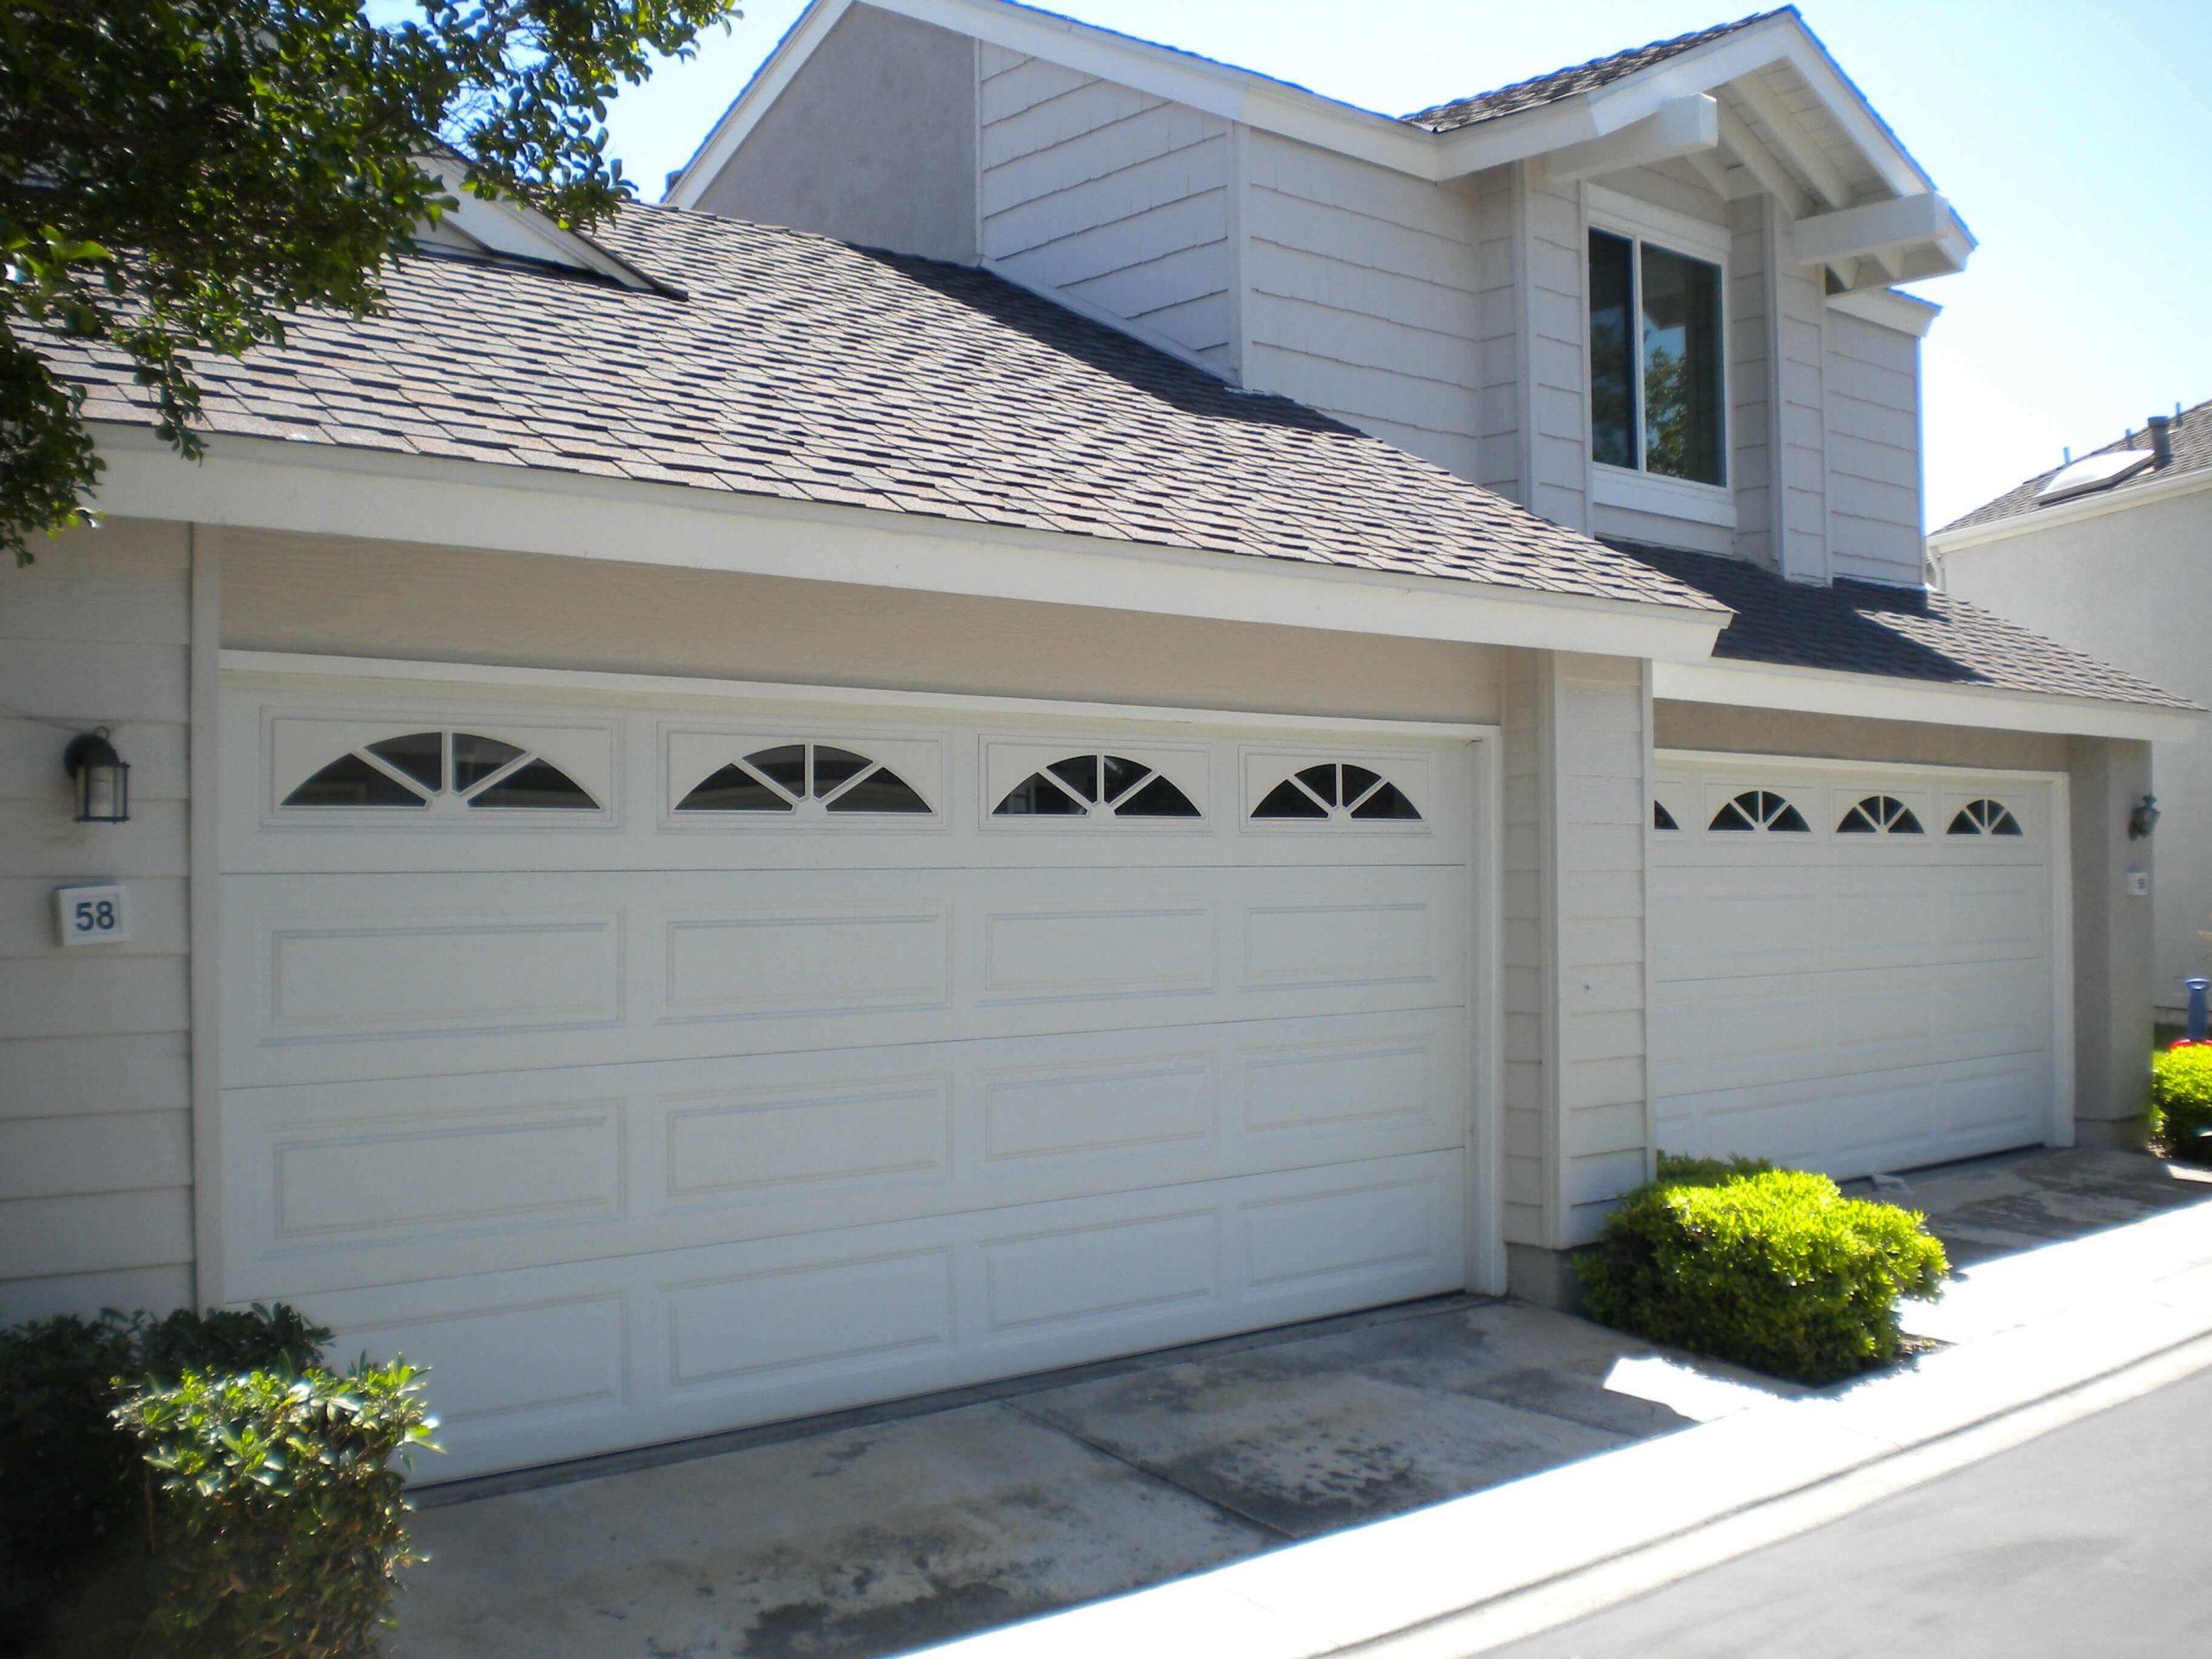 3 Homeowner Tips For Garage Door Safety Month